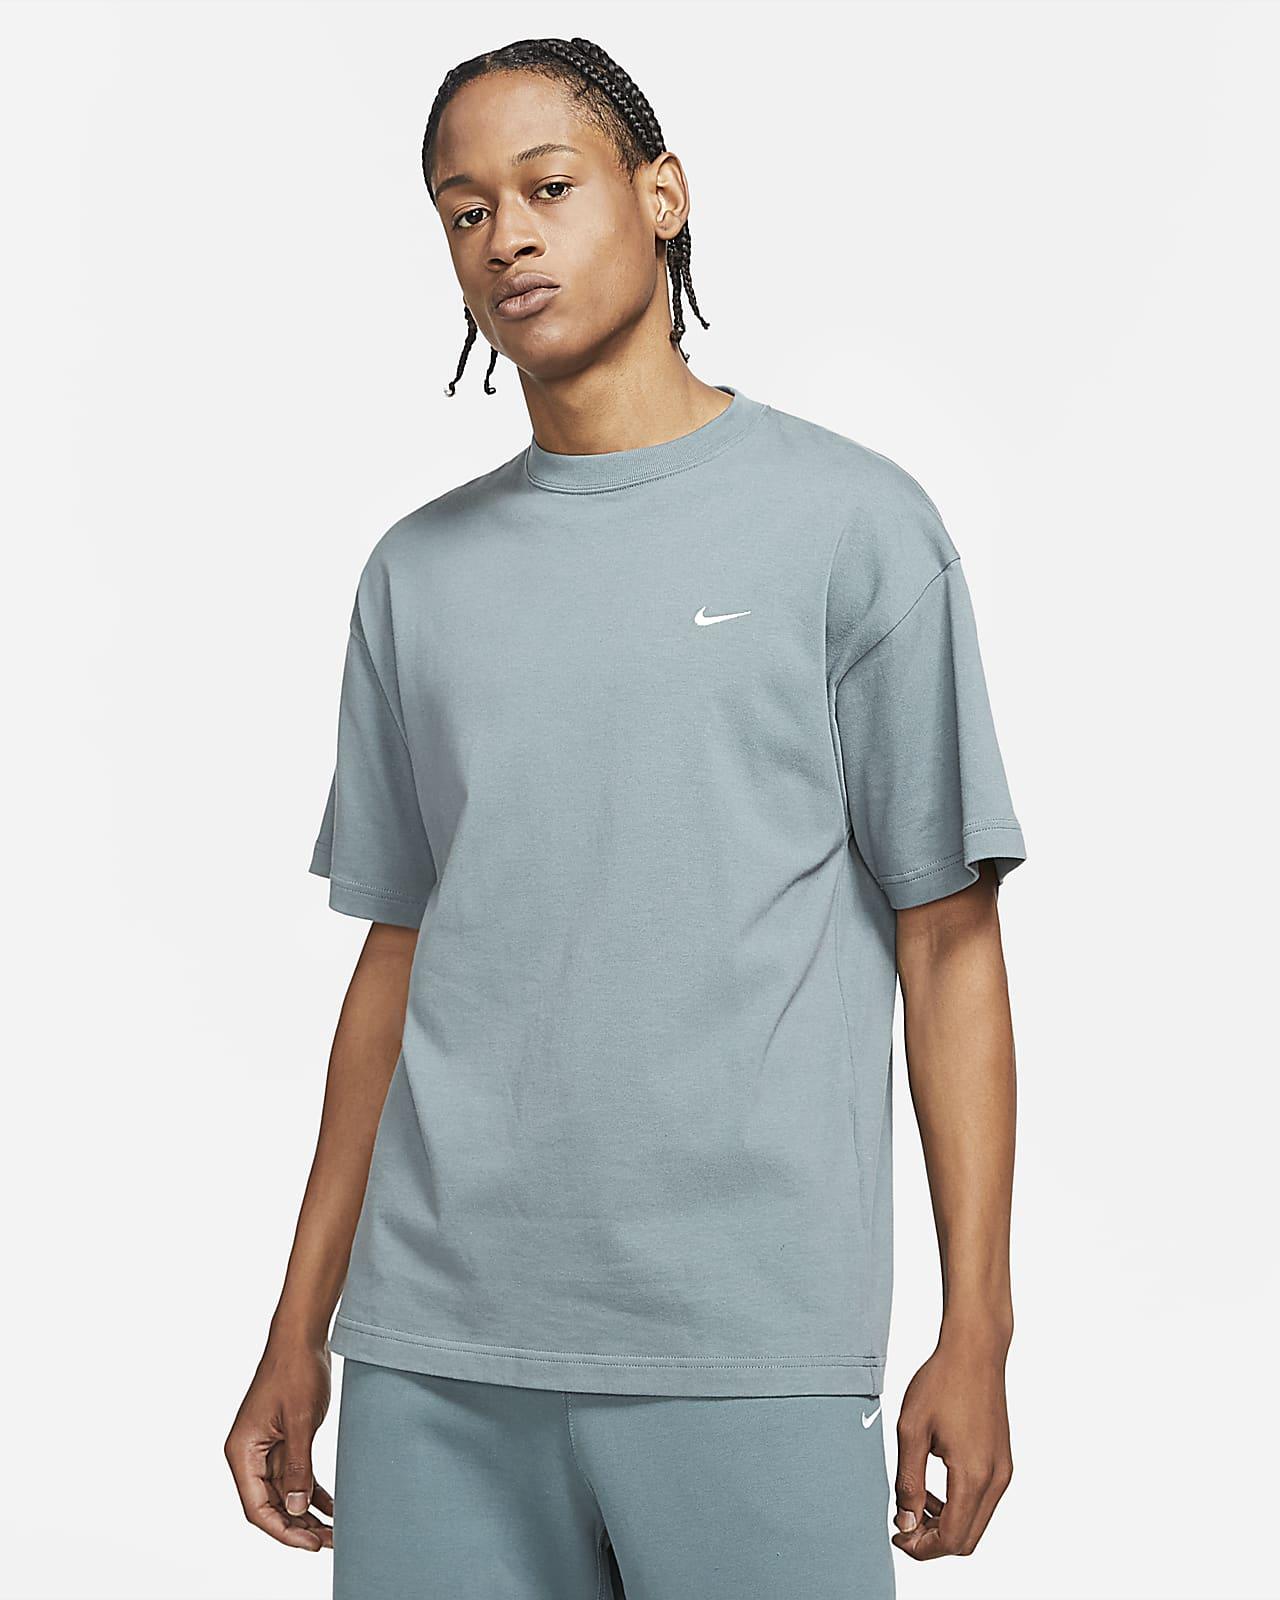 Nike Solo Swoosh Herren-T-Shirt